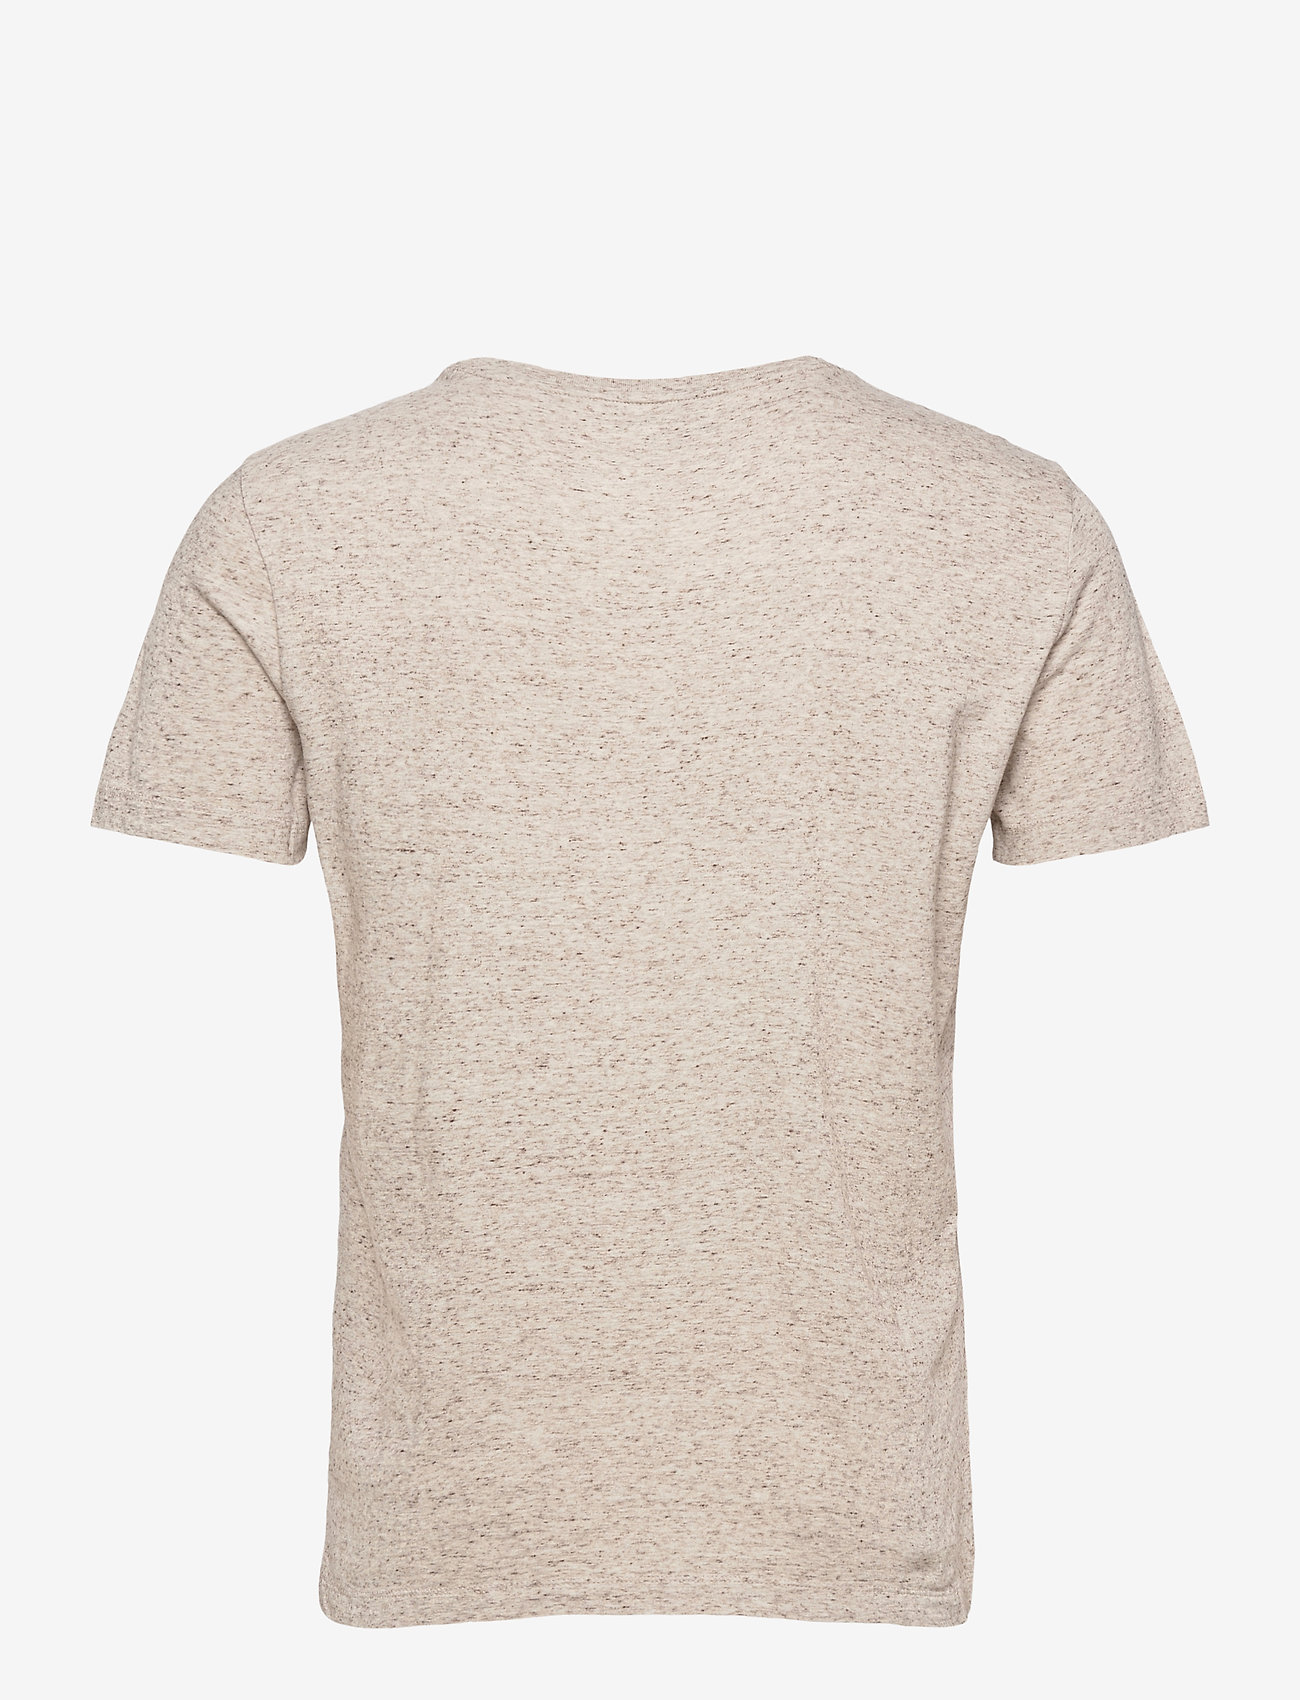 Banana Republic - I LOGO SOFTWASH ORGANIC TEE - basic t-shirts - oatmeal htr b0279 - 1